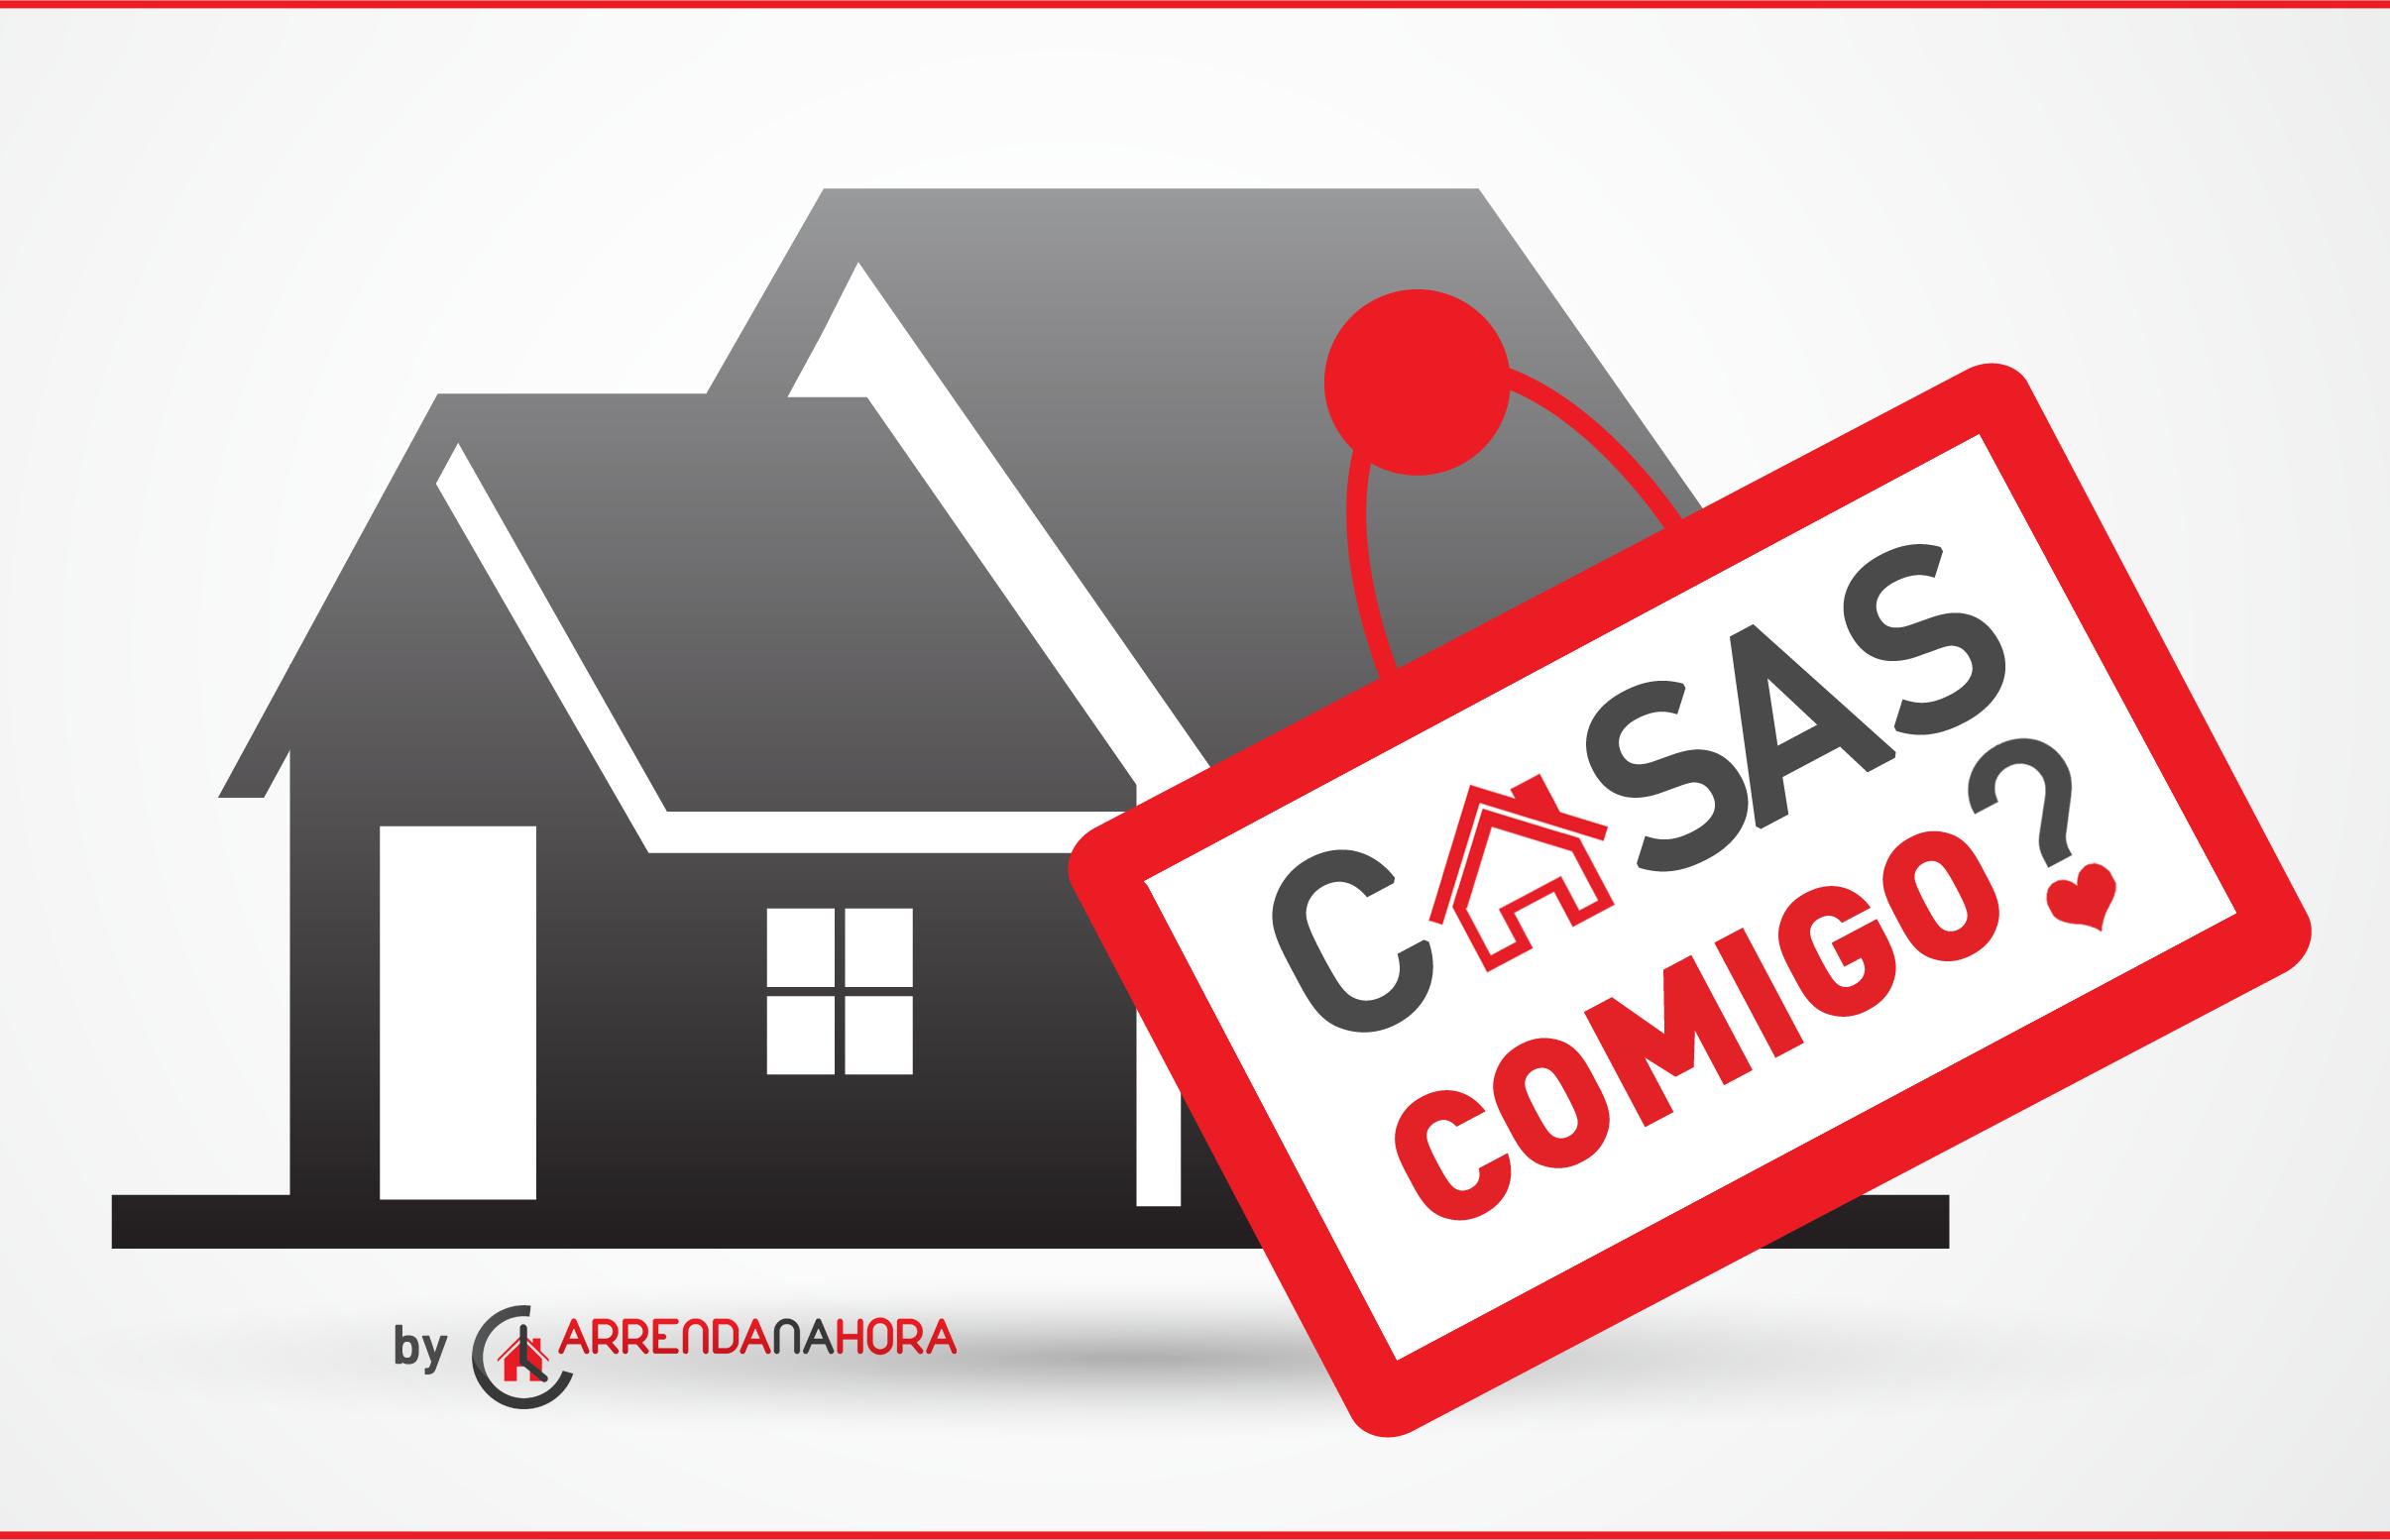 """Casas Comigo?"" by Arrenda na Hora"